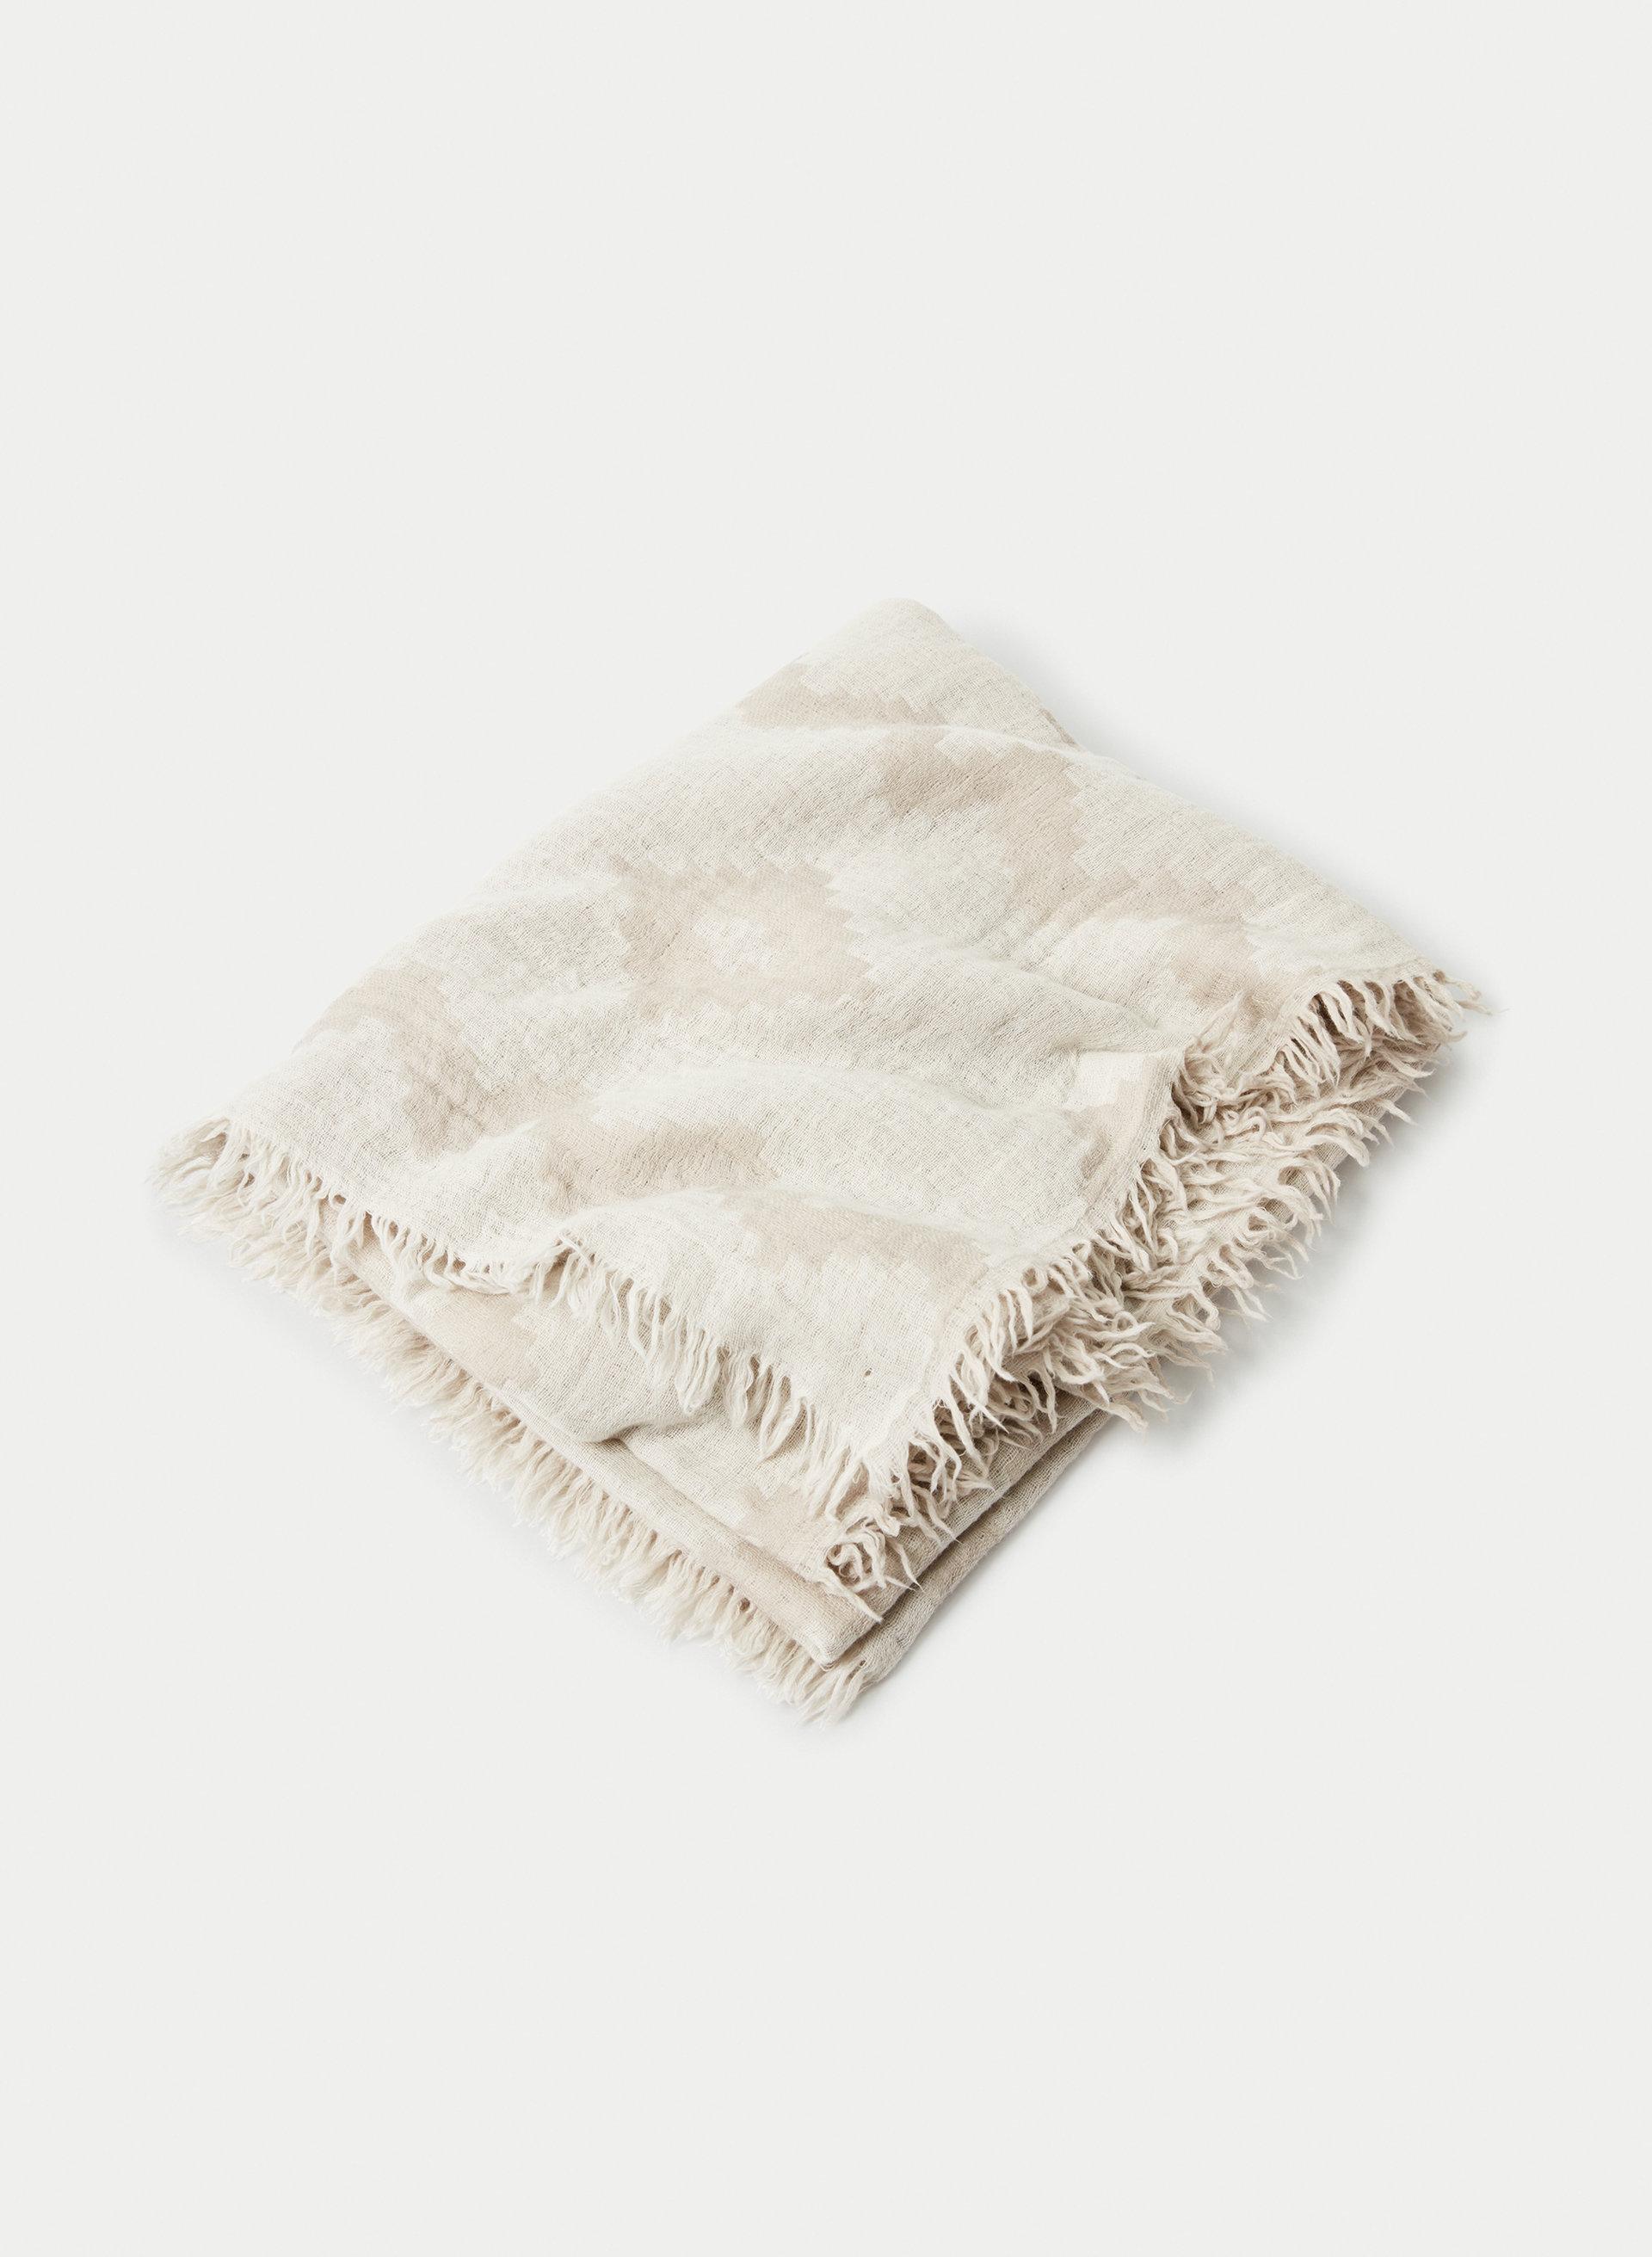 13ca0b6e2eb69 DIAMOND MOSAIC BLANKET SCARF - Patterned, wool blanket scarf